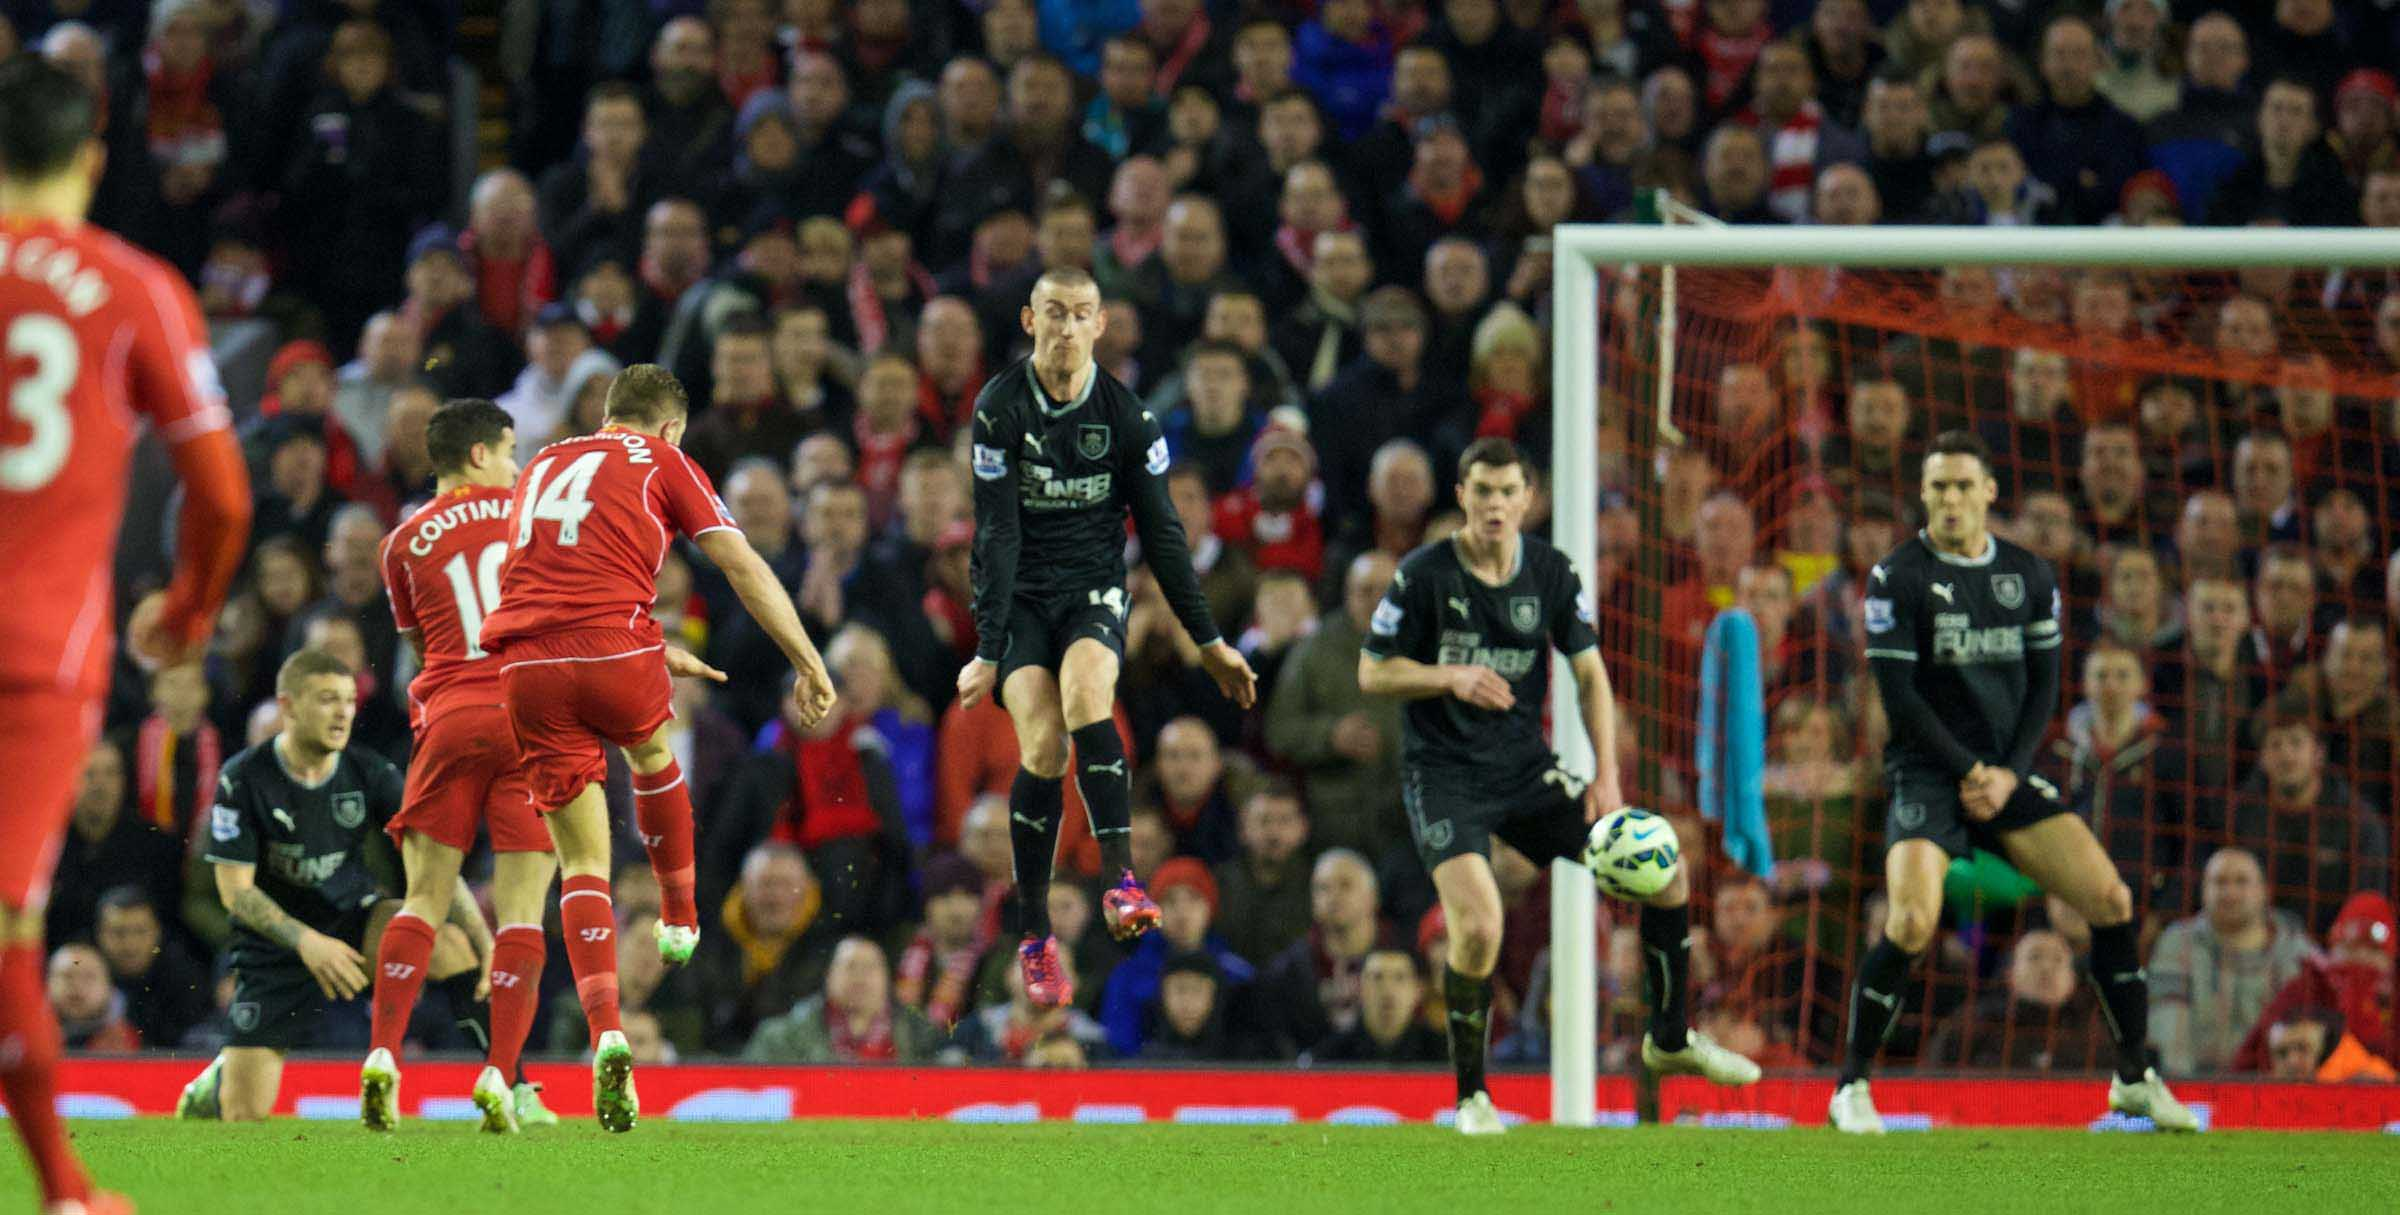 Football - FA Premier League - Liverpool FC v Burnley FC